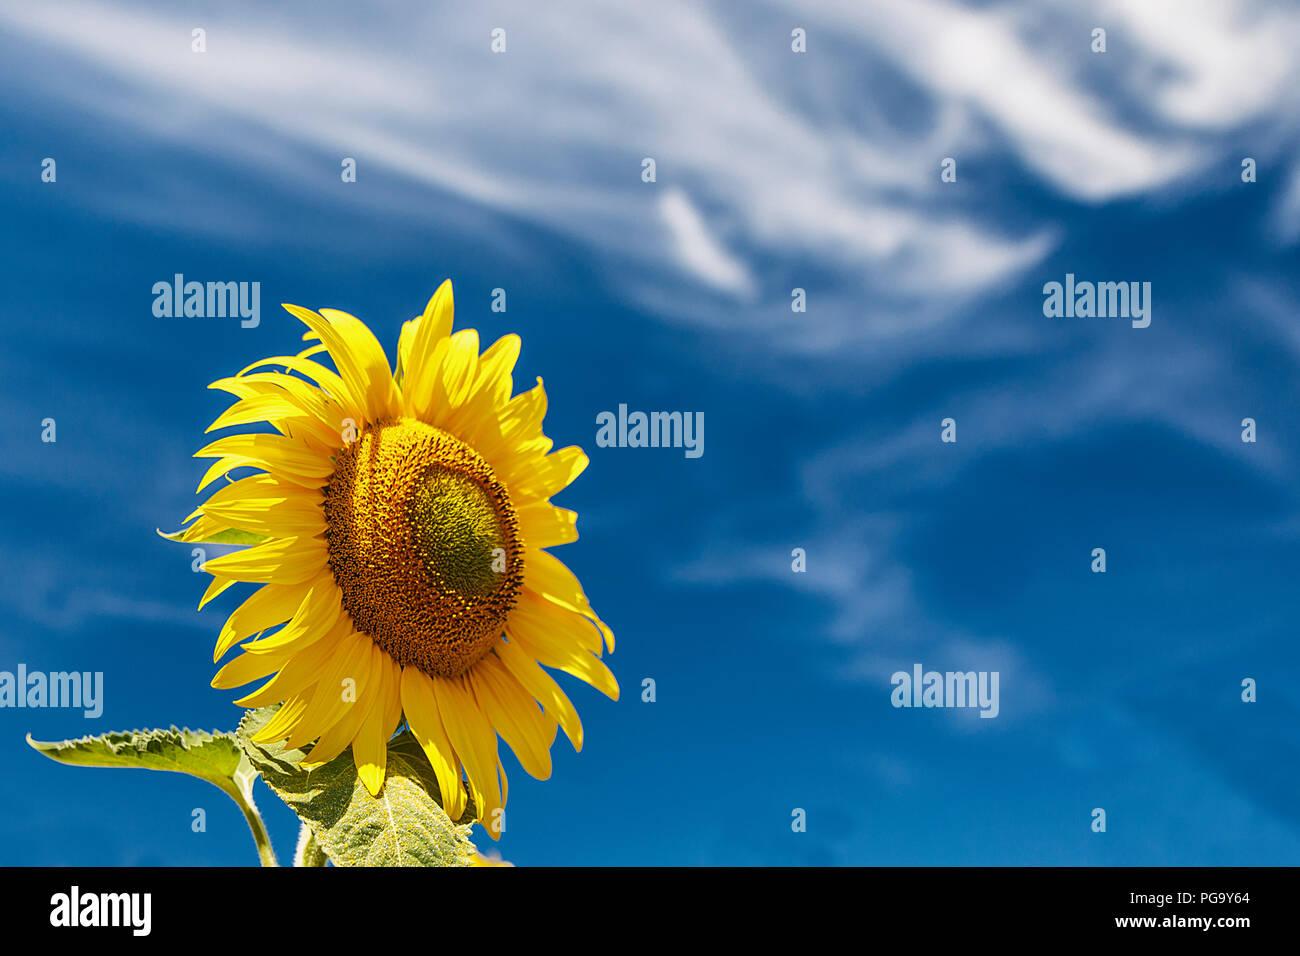 the sunflower II Stock Photo